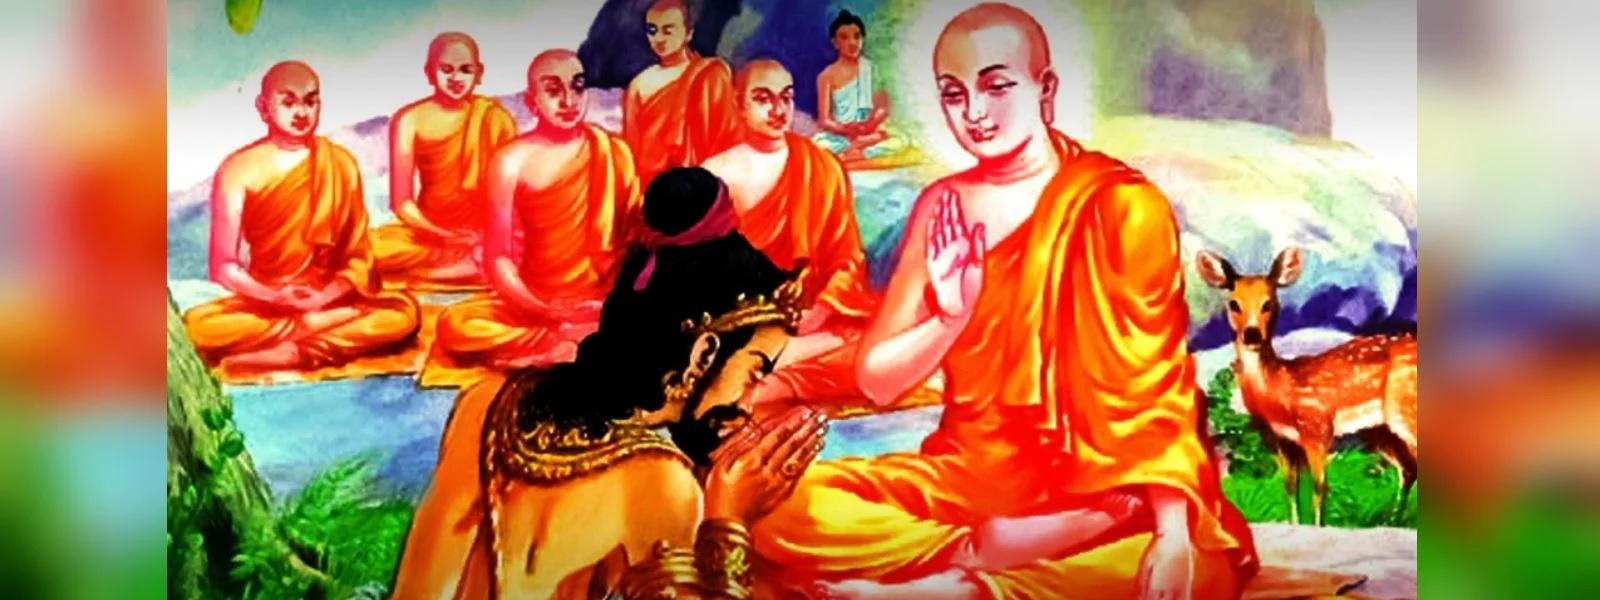 Buddhists across the globe celebrate Poson poya today